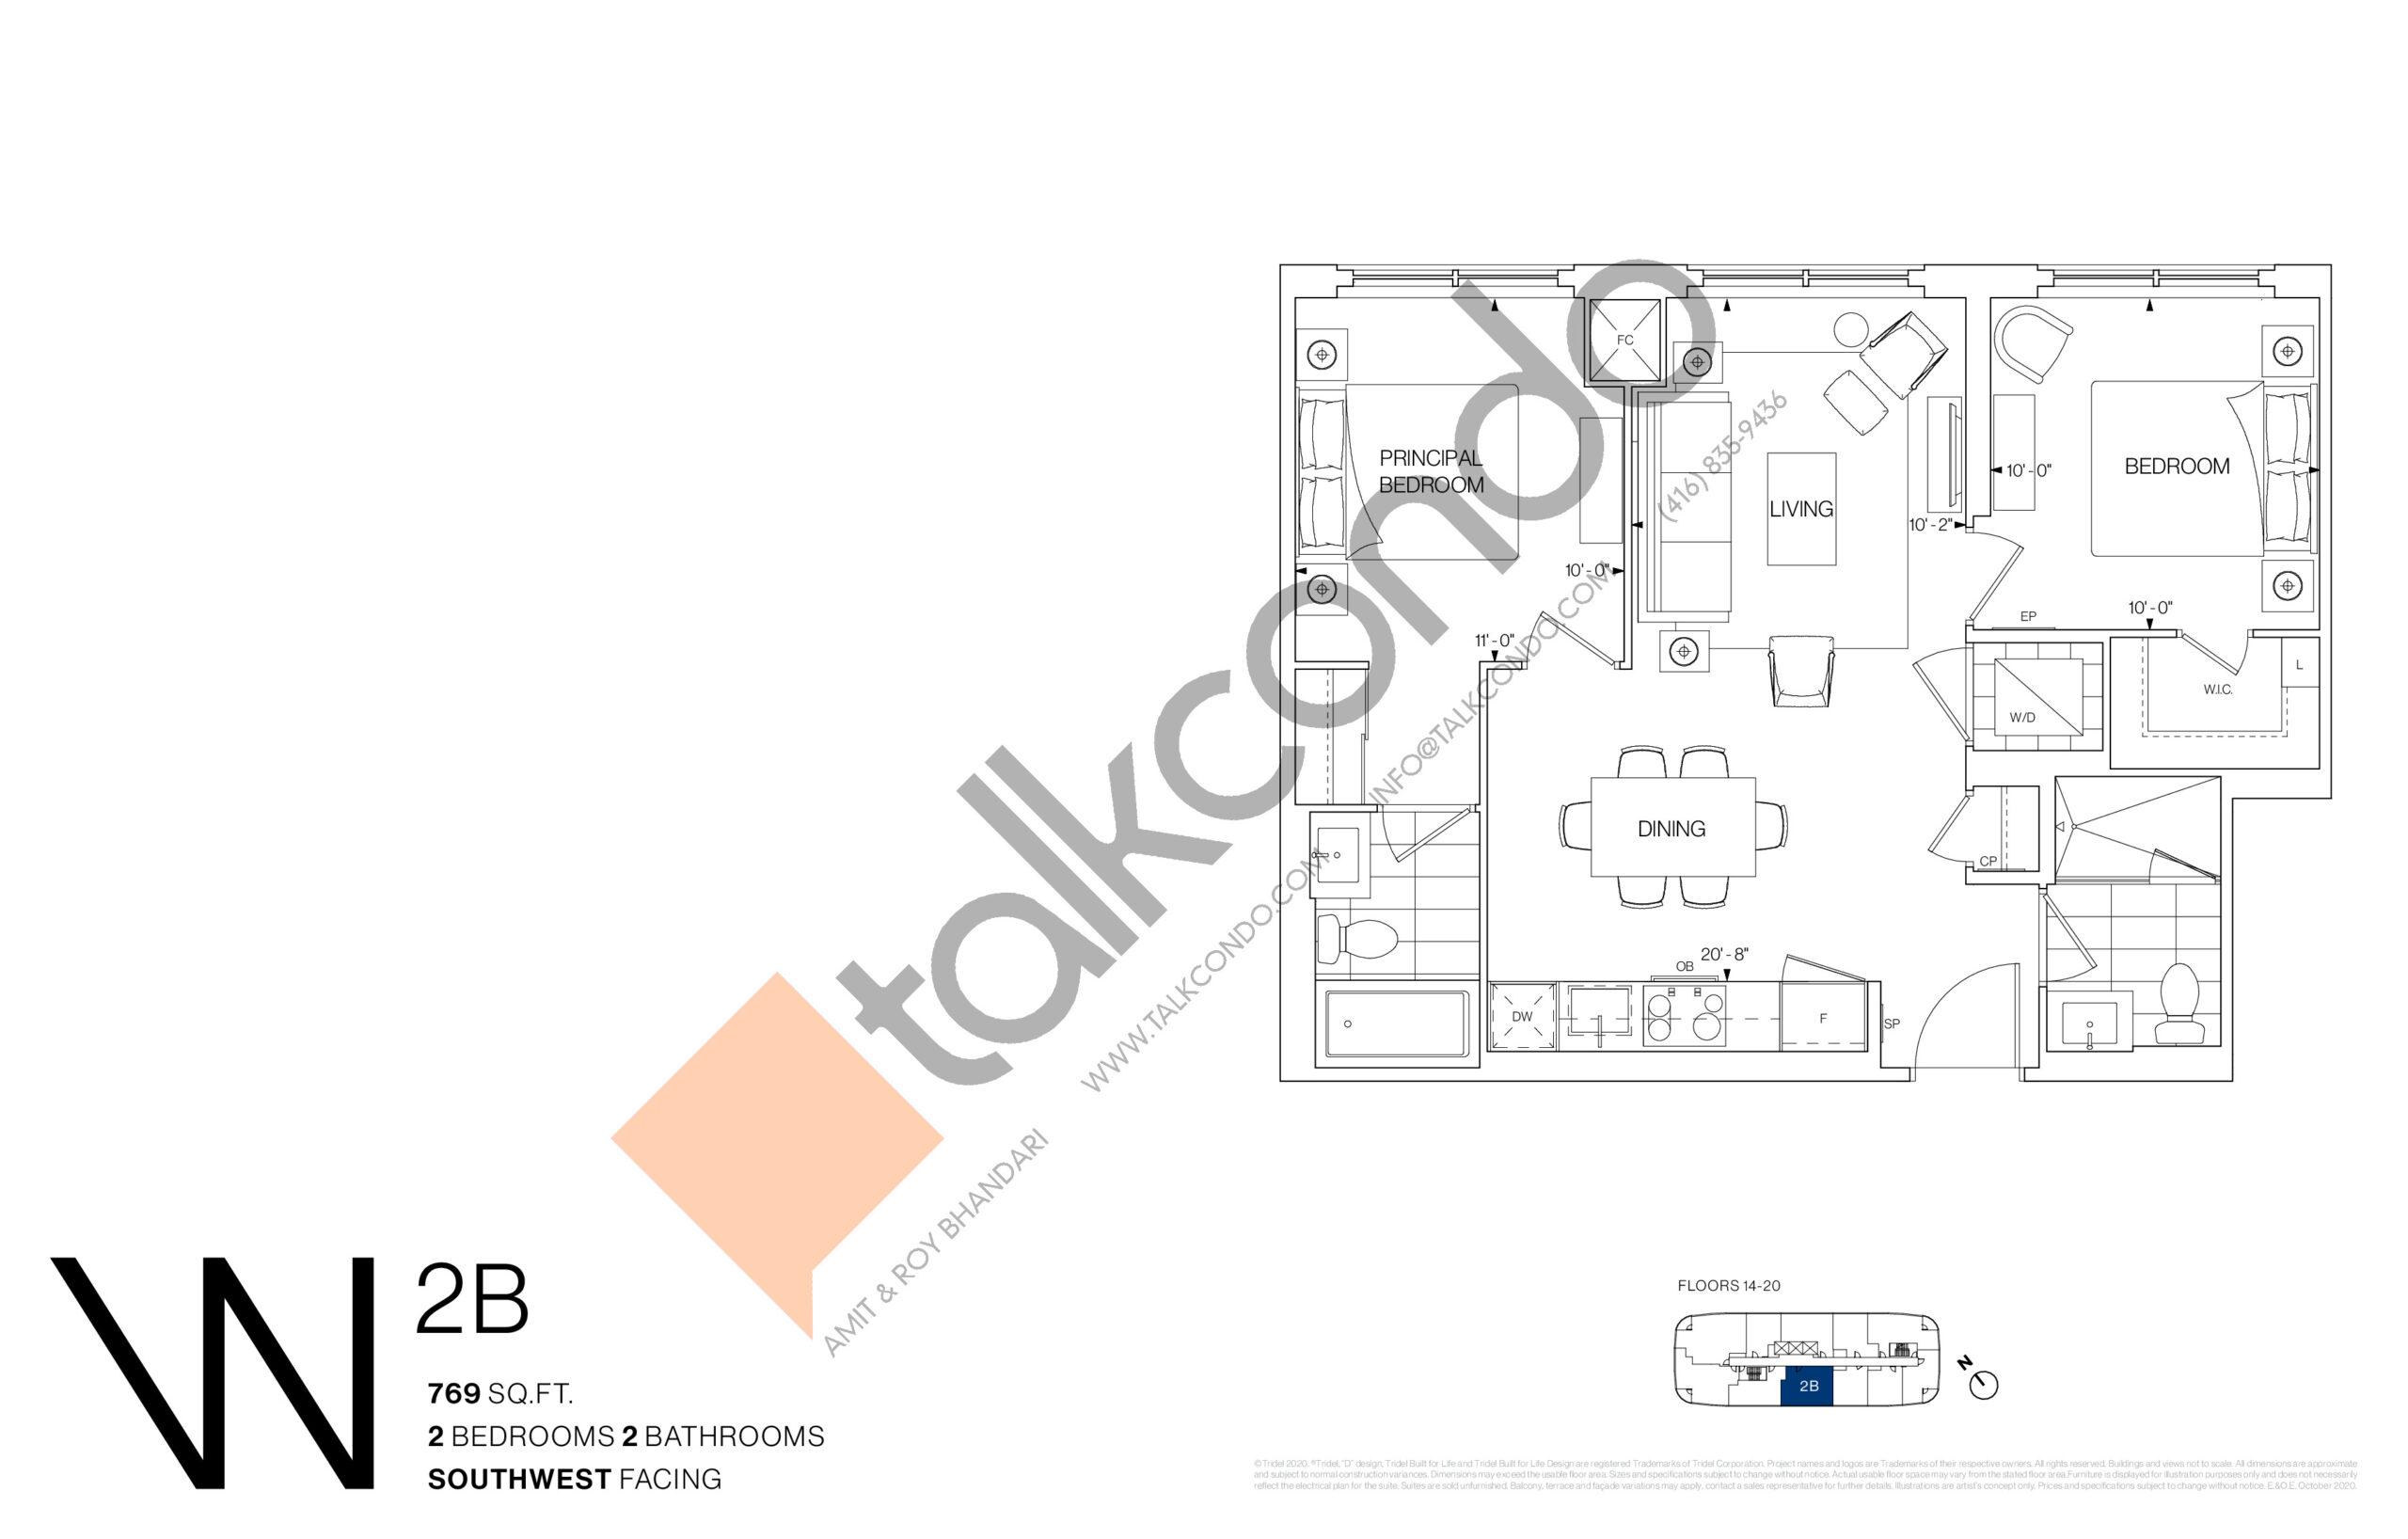 2B Floor Plan at Westerly Condos - 769 sq.ft